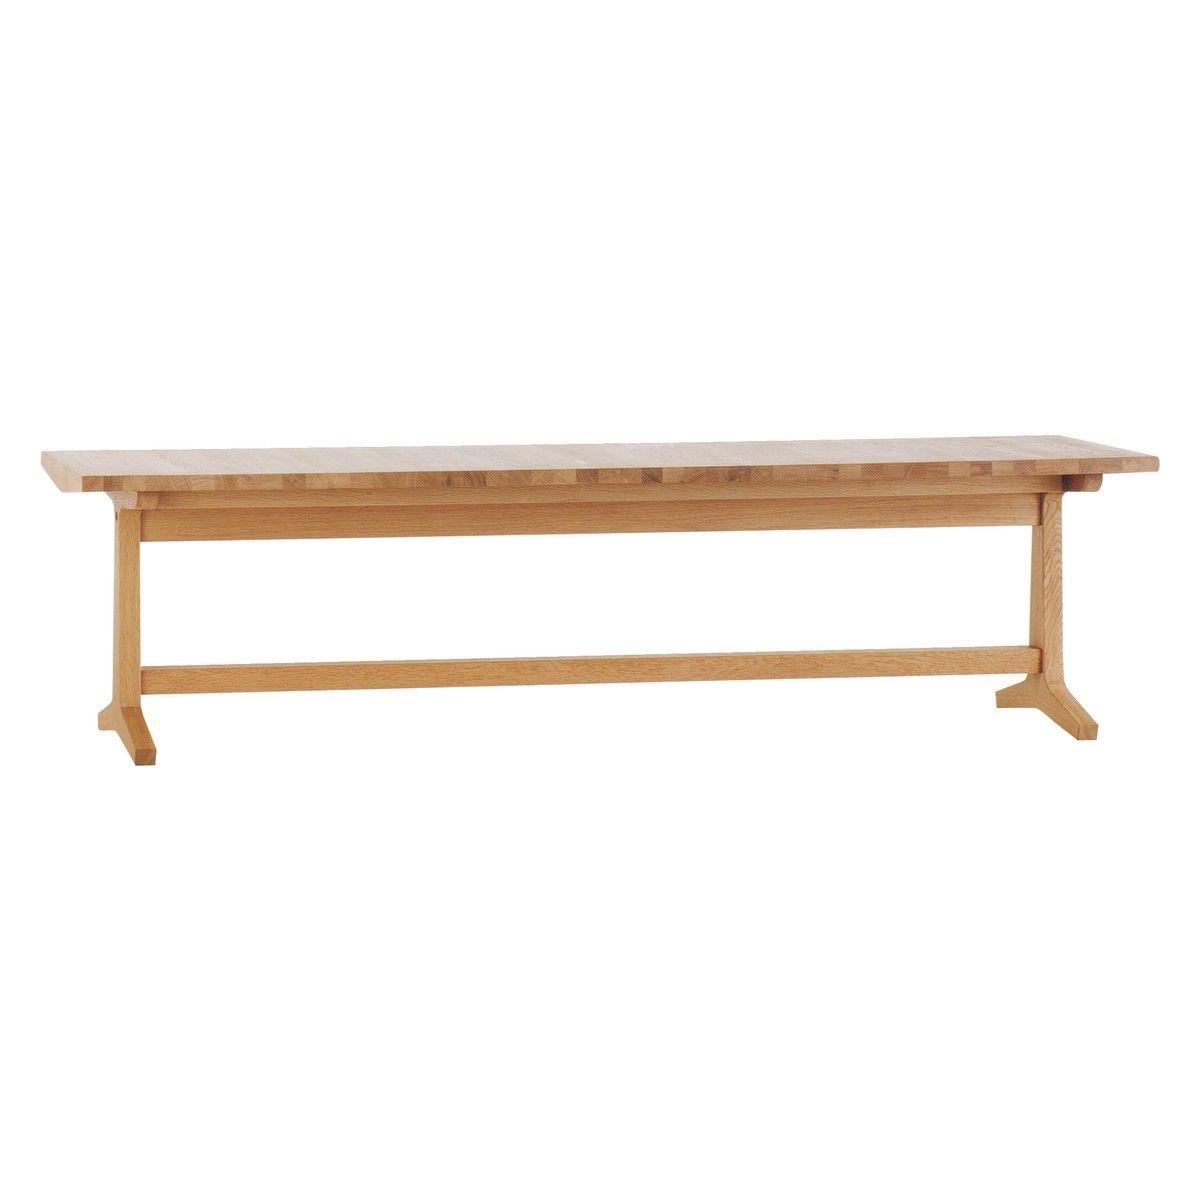 PARKER 4 Seater Oak Dining Bench